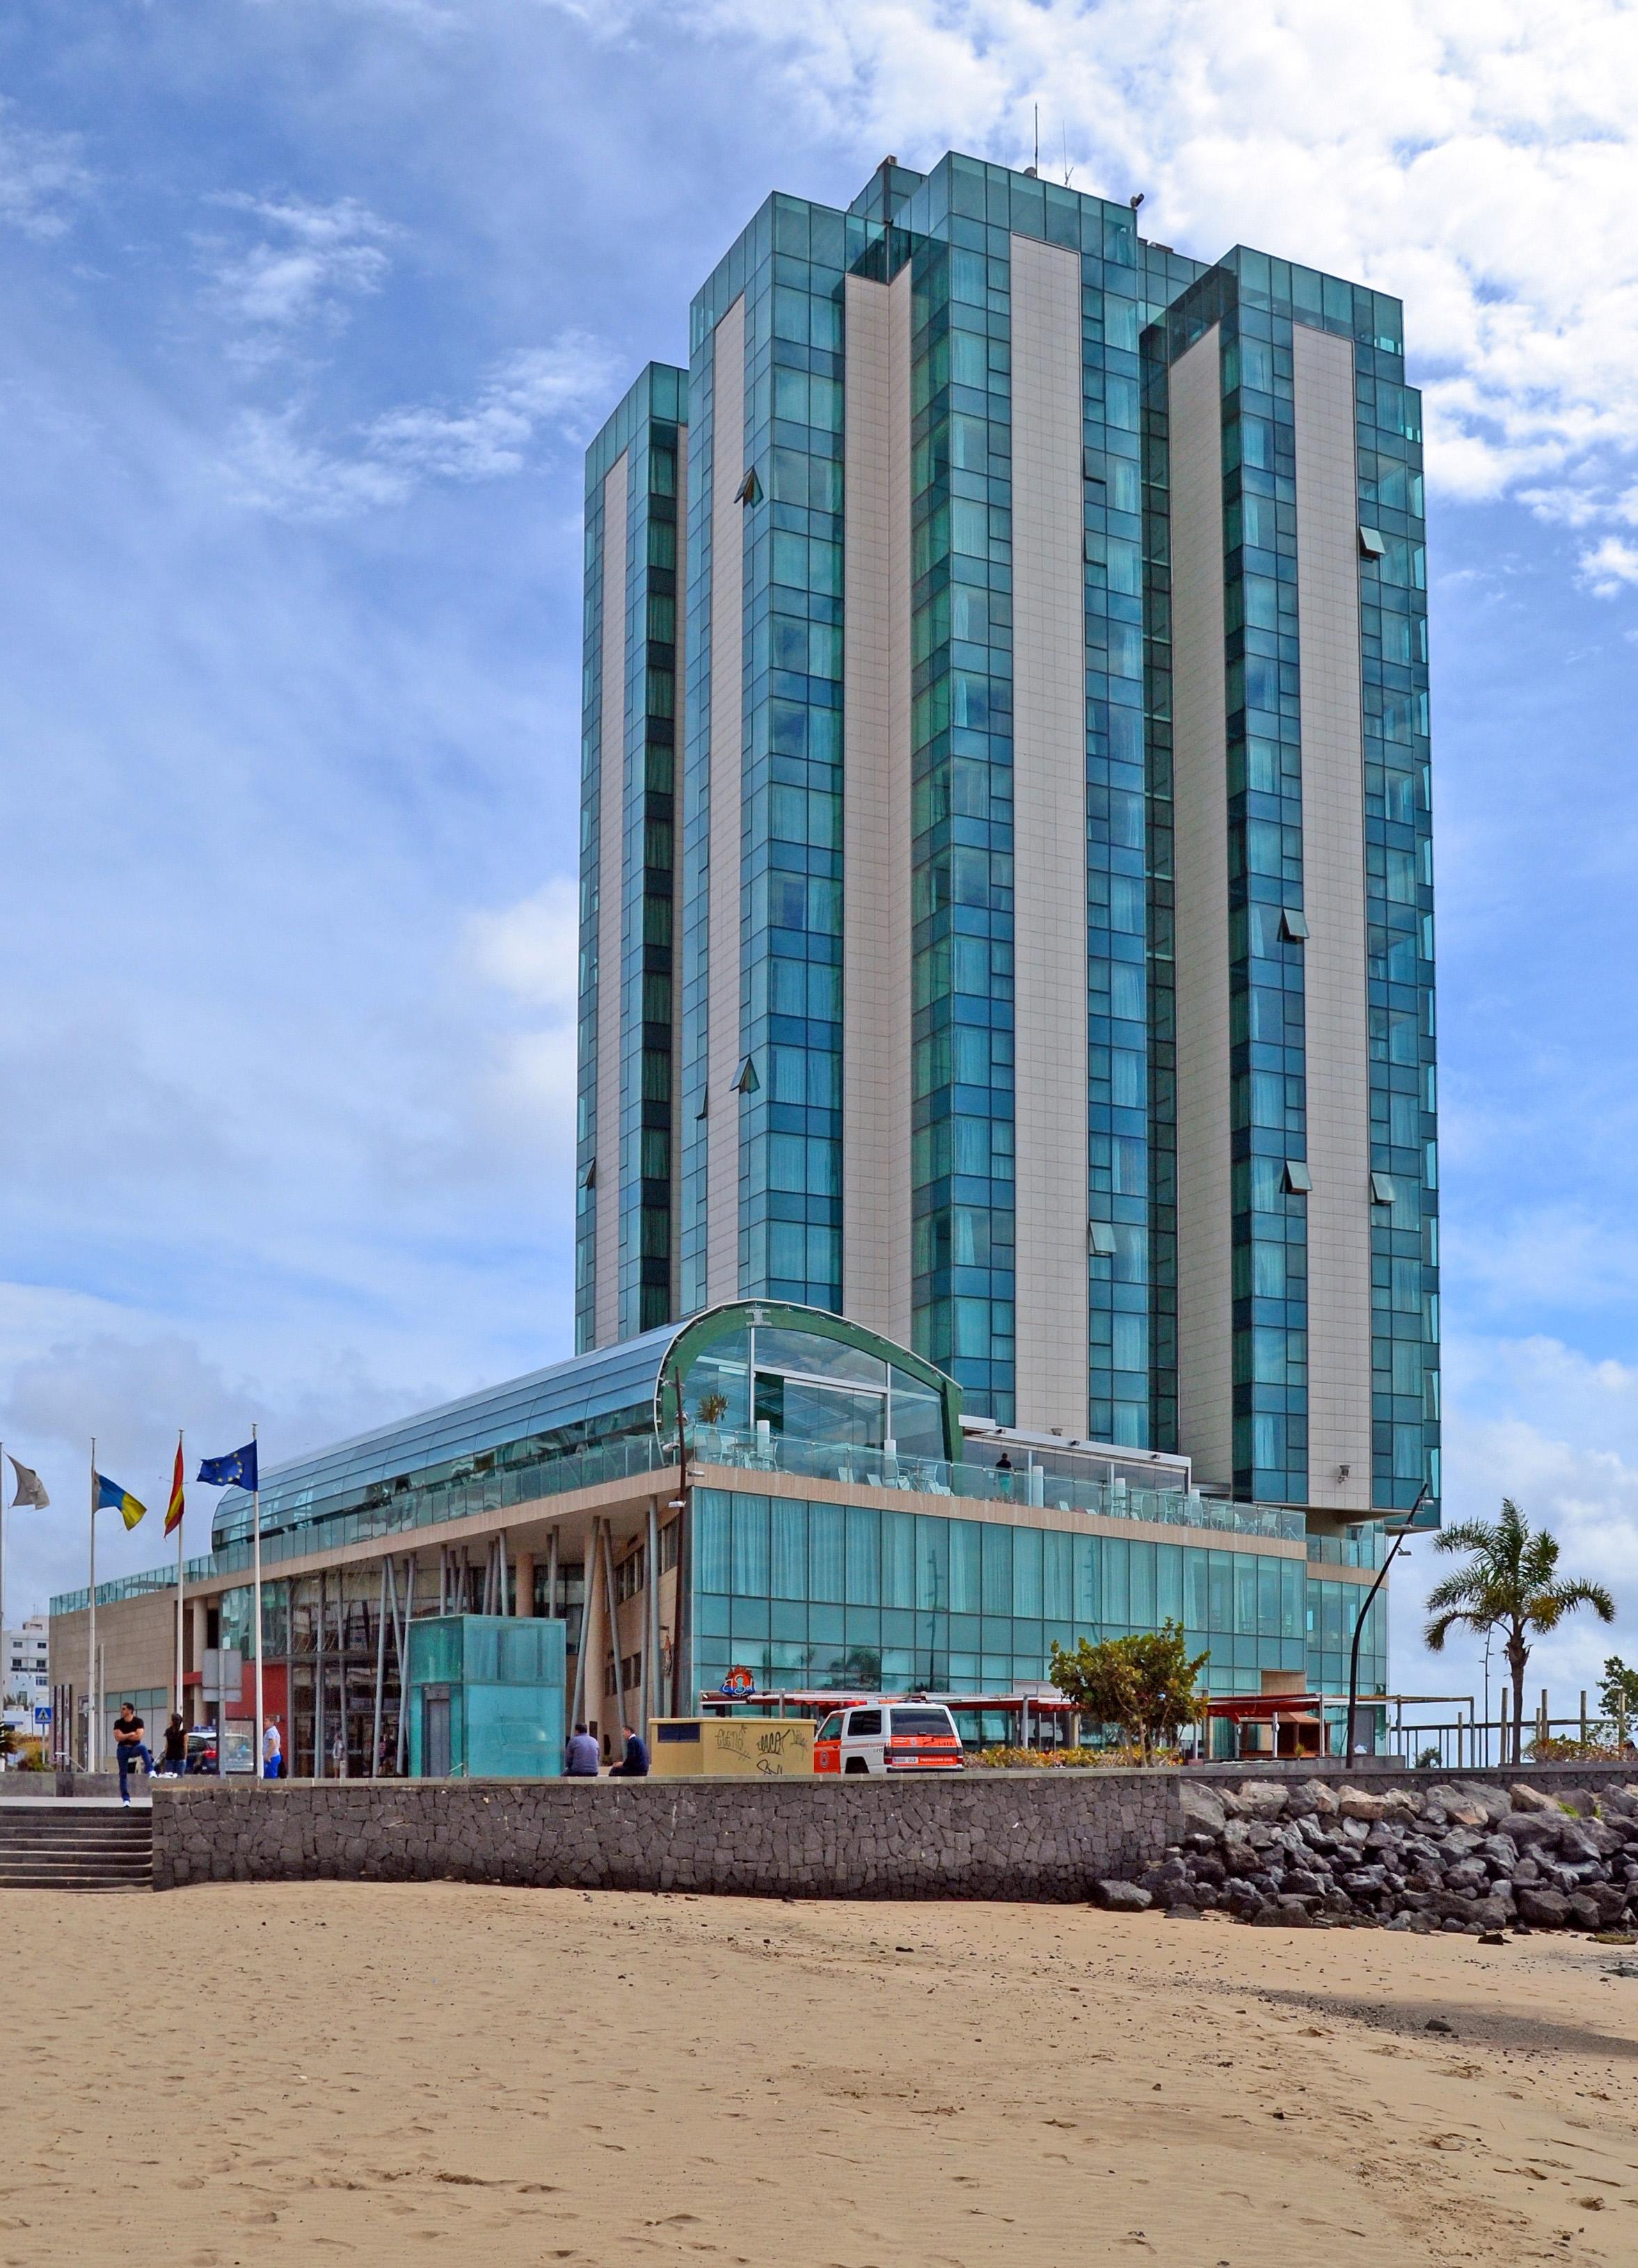 Hotels In Der Nahe Des Muscials Kong Der Lowen